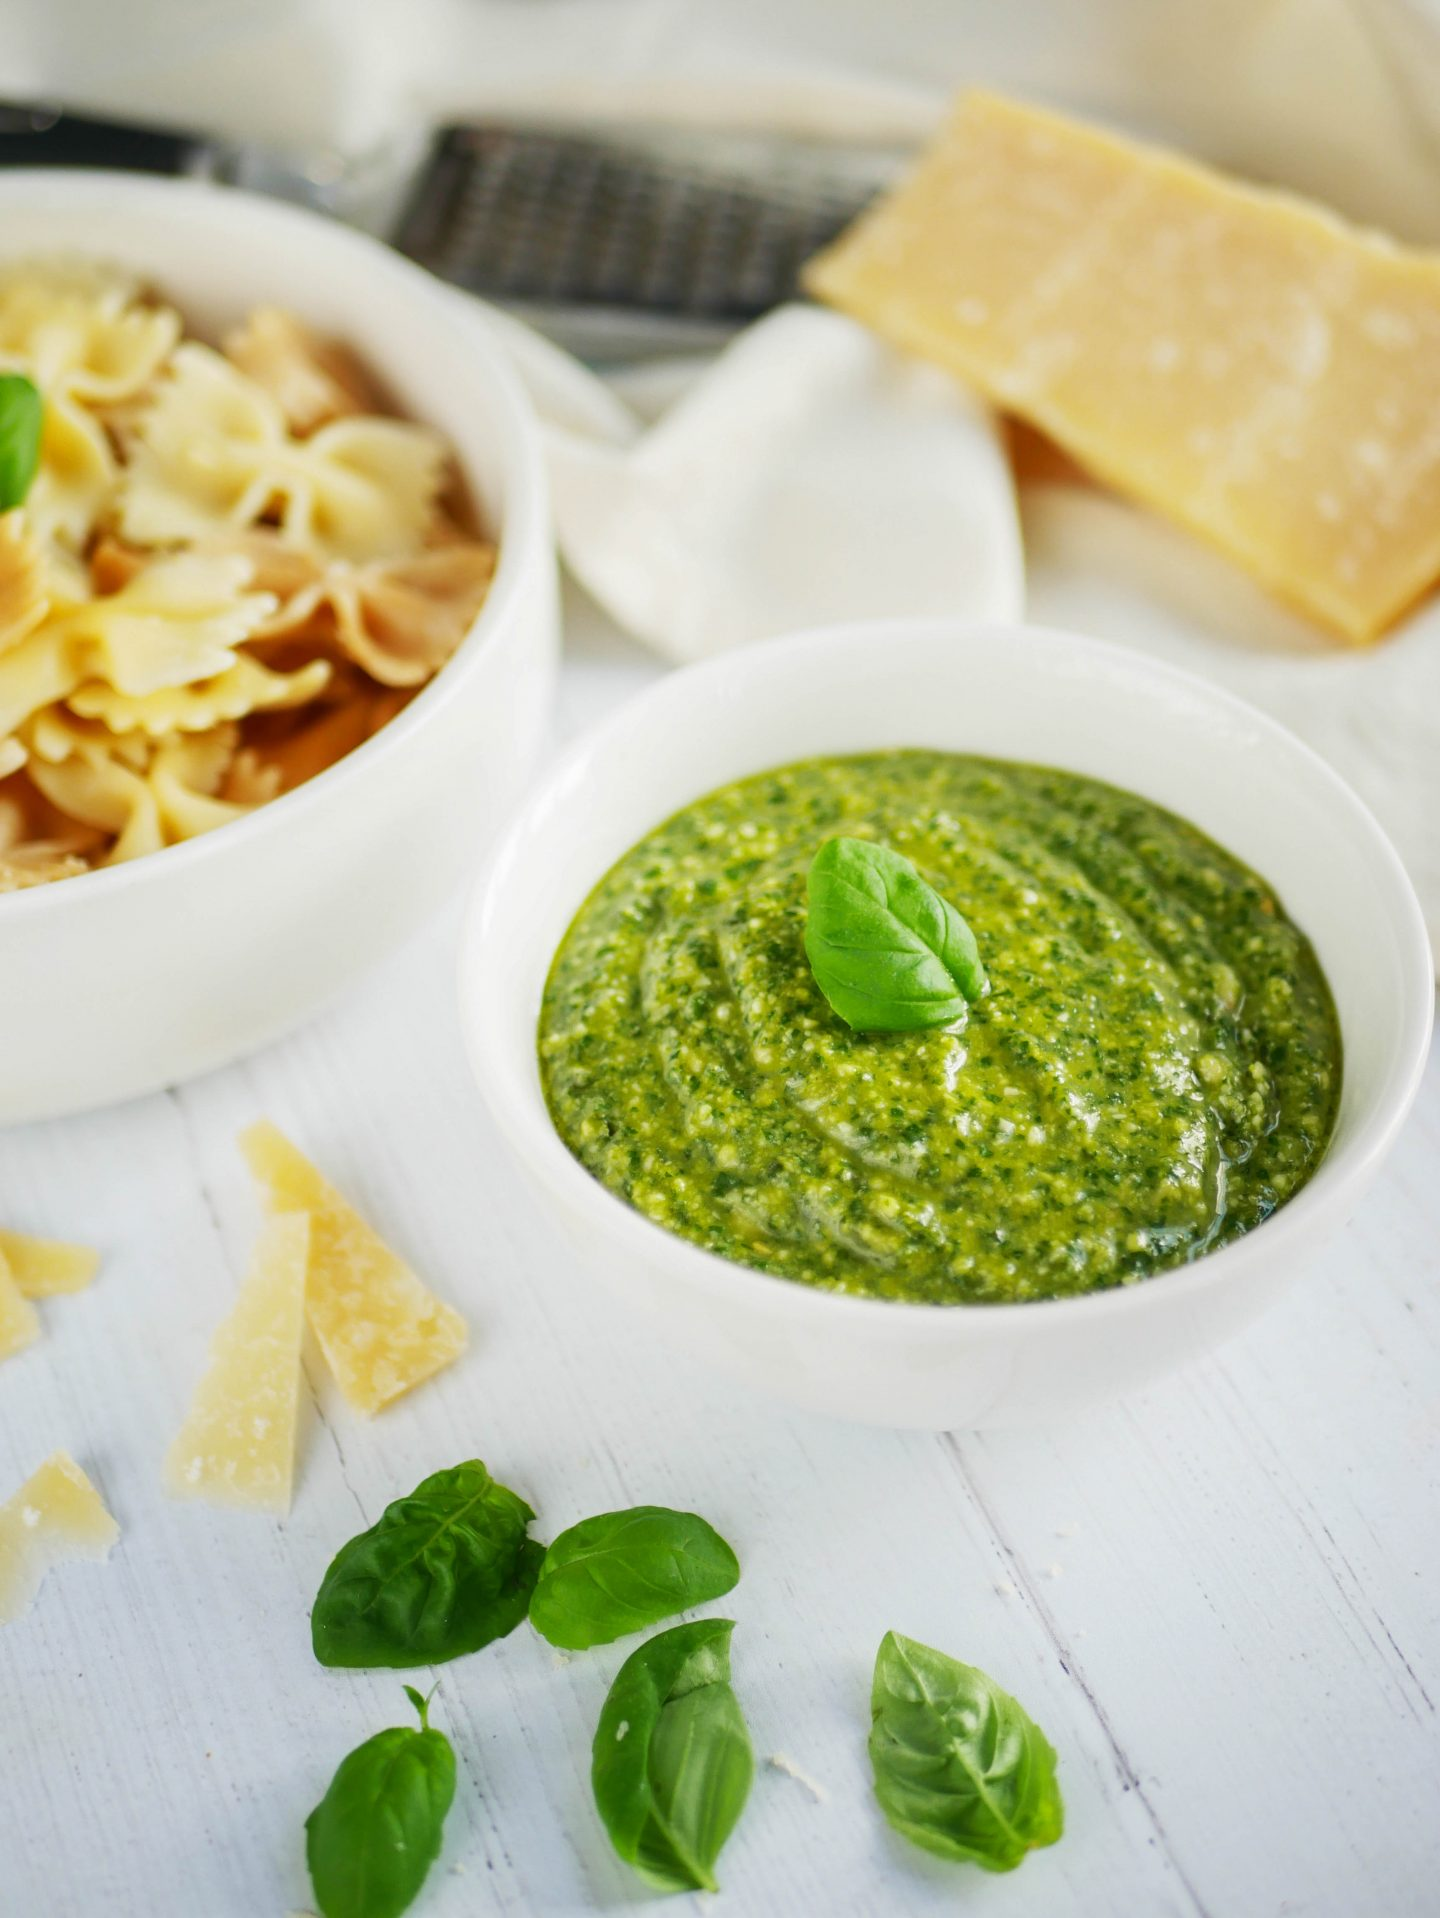 Recette Pesto basilic maison